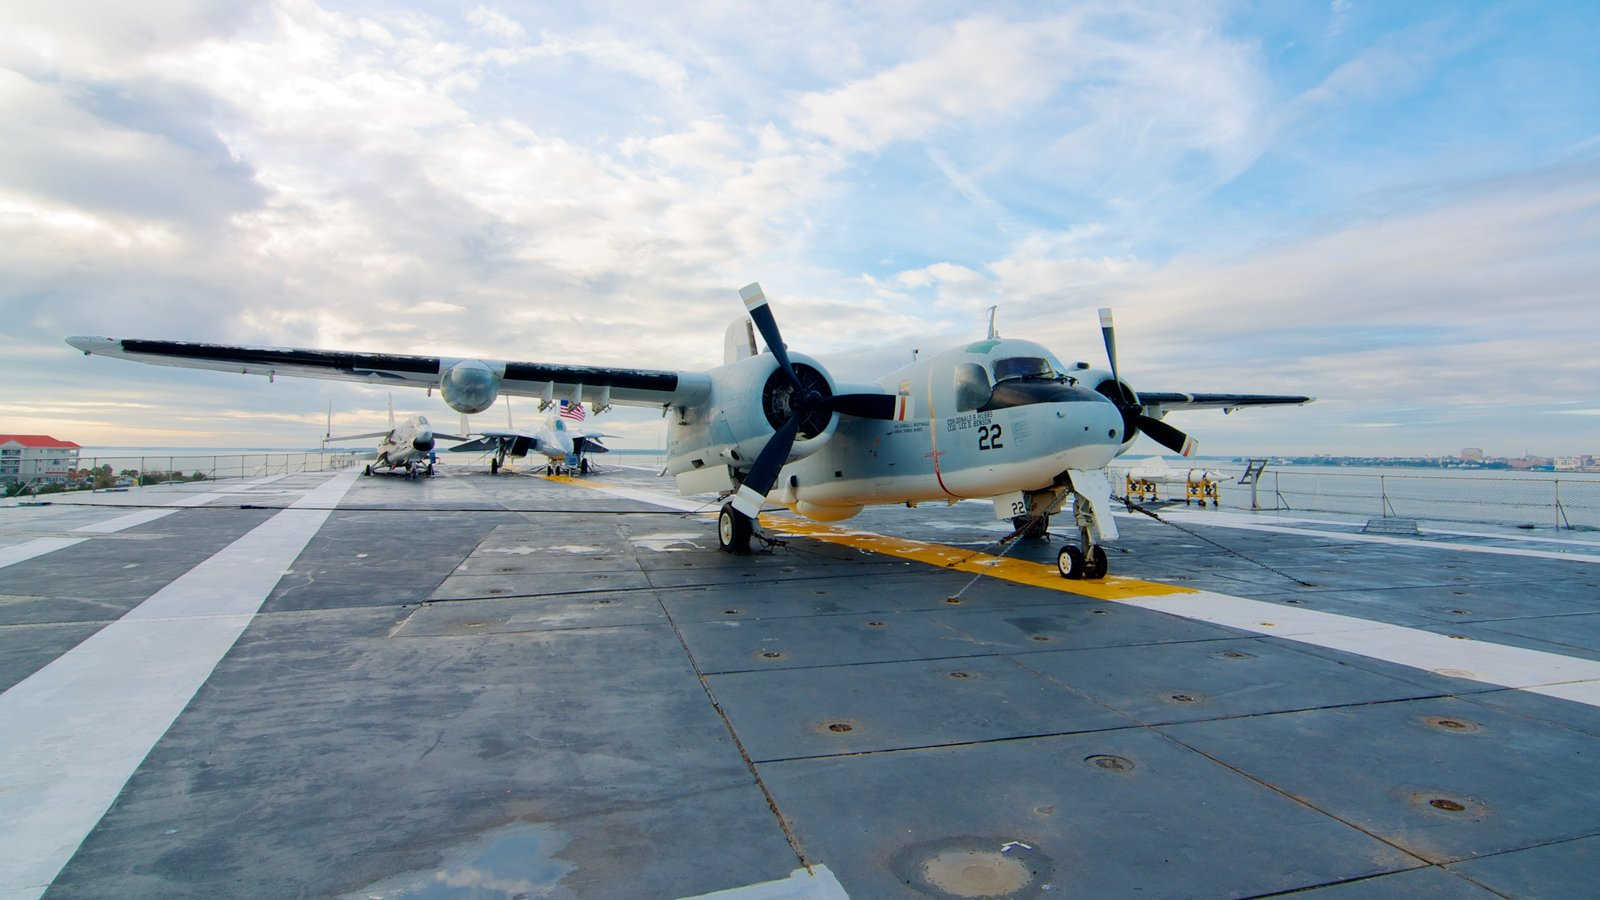 USS Yorktown caracterizando uma aeronave, aeronave e um aeroporto